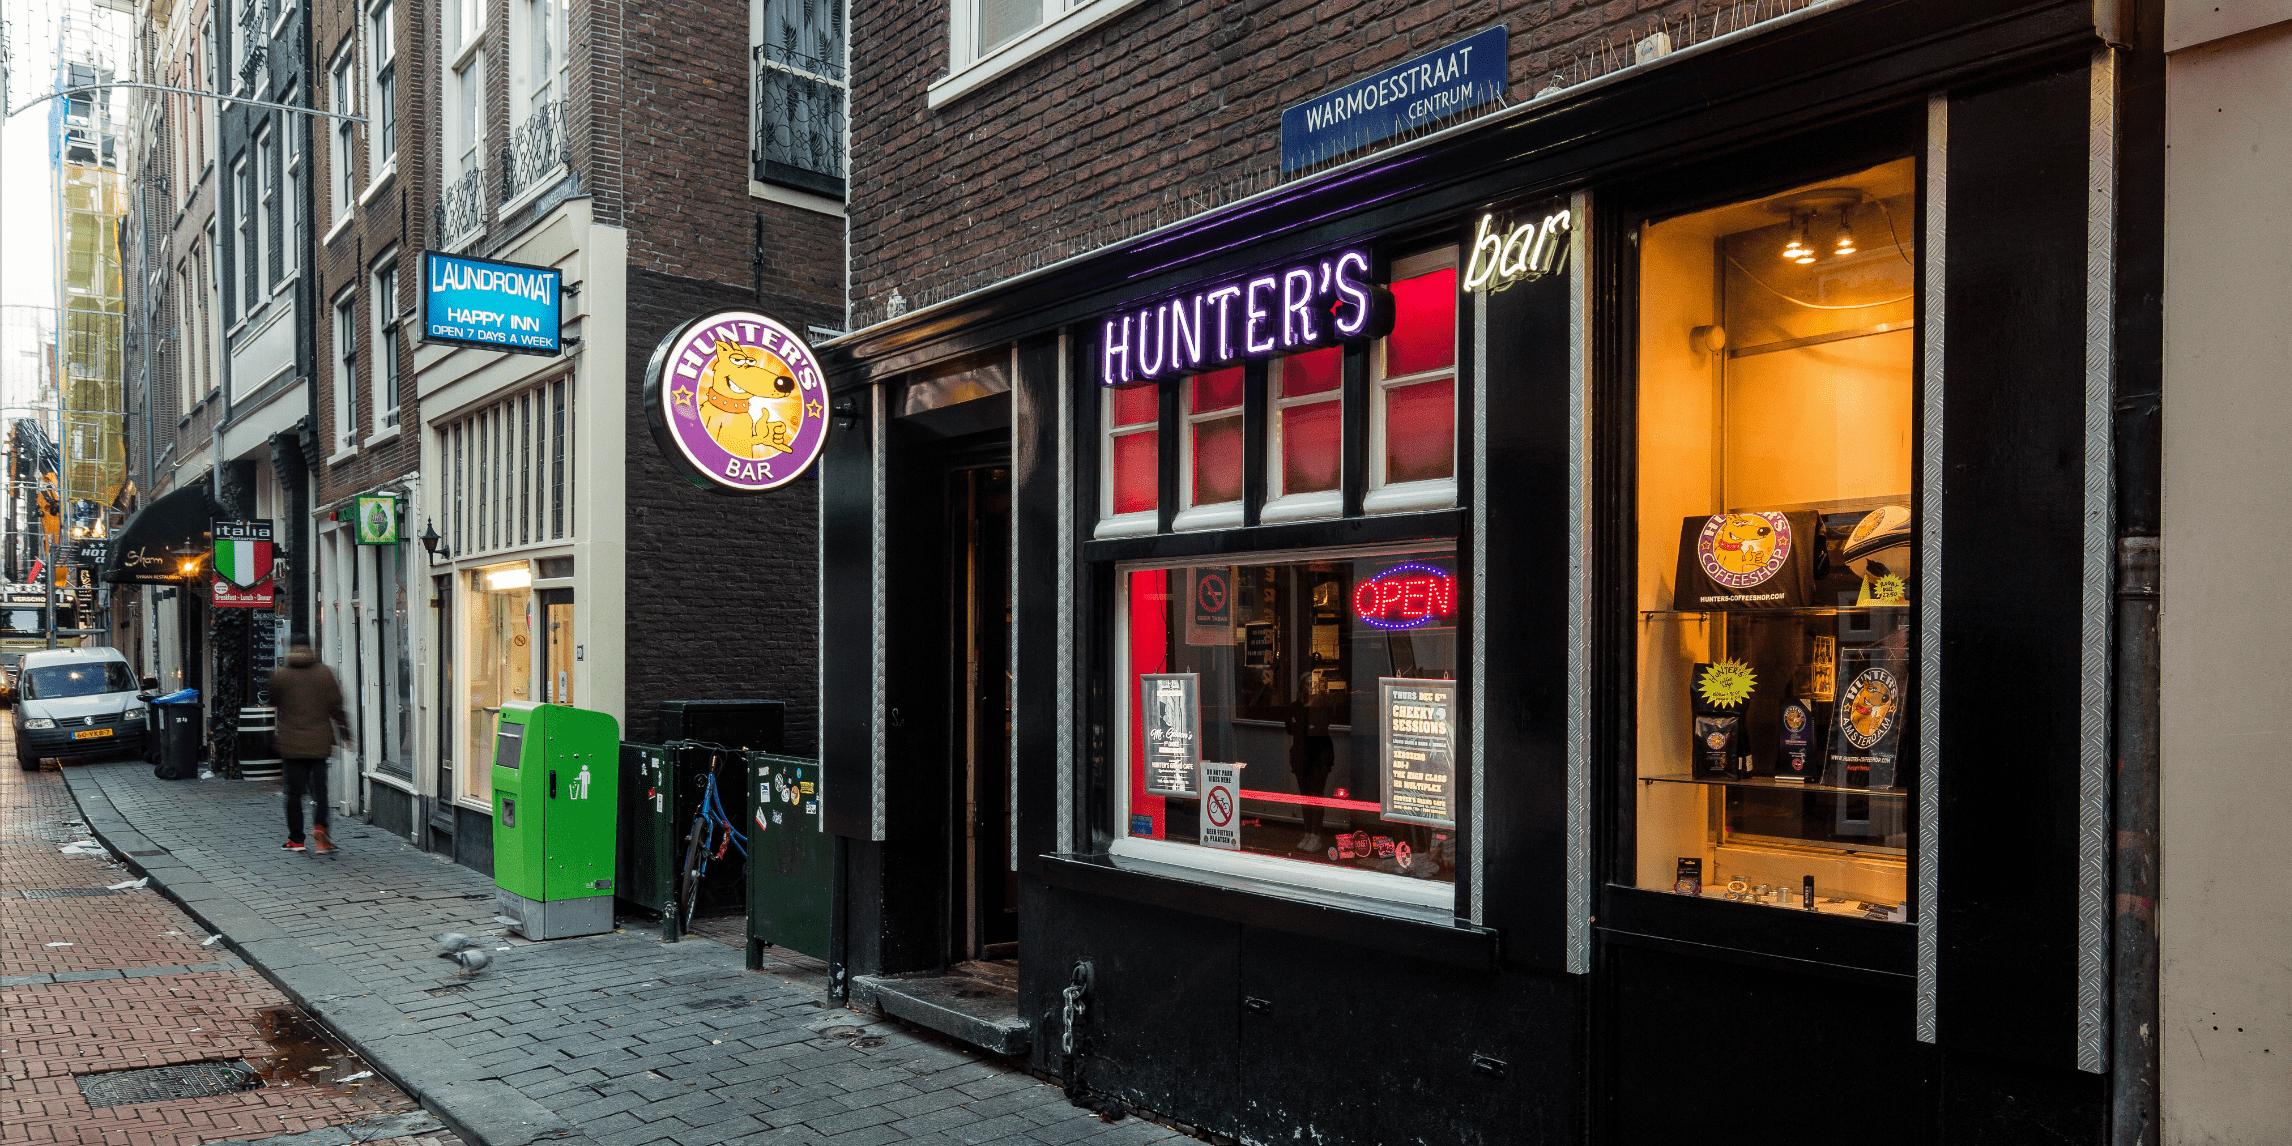 Hunter's Warmoestraat